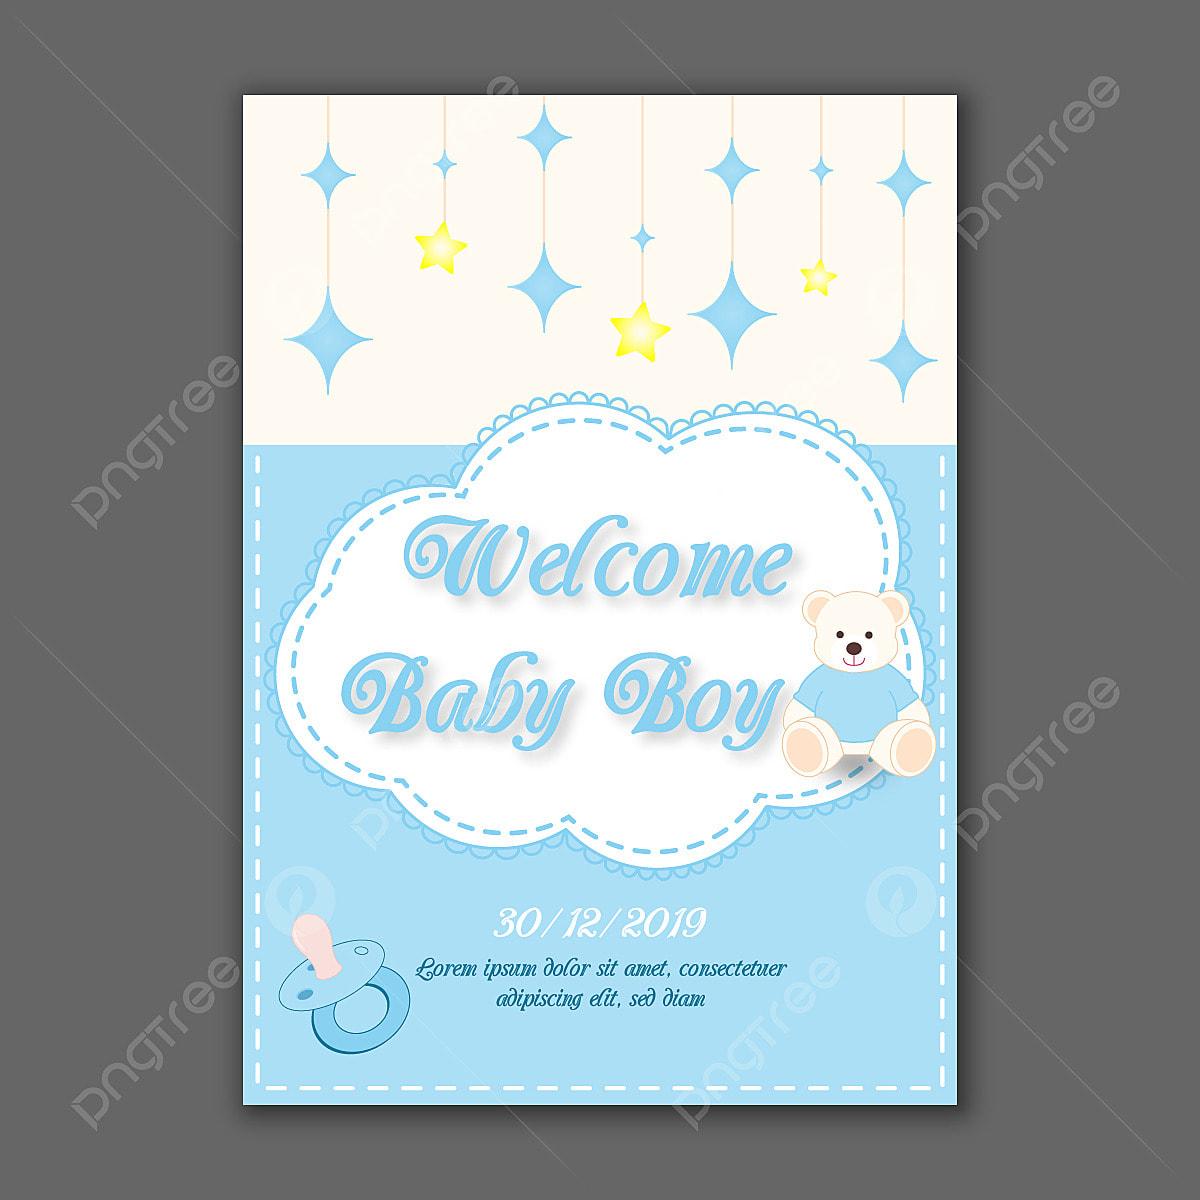 Vector Baby Shower Invitation Template, Illustration, Invitation